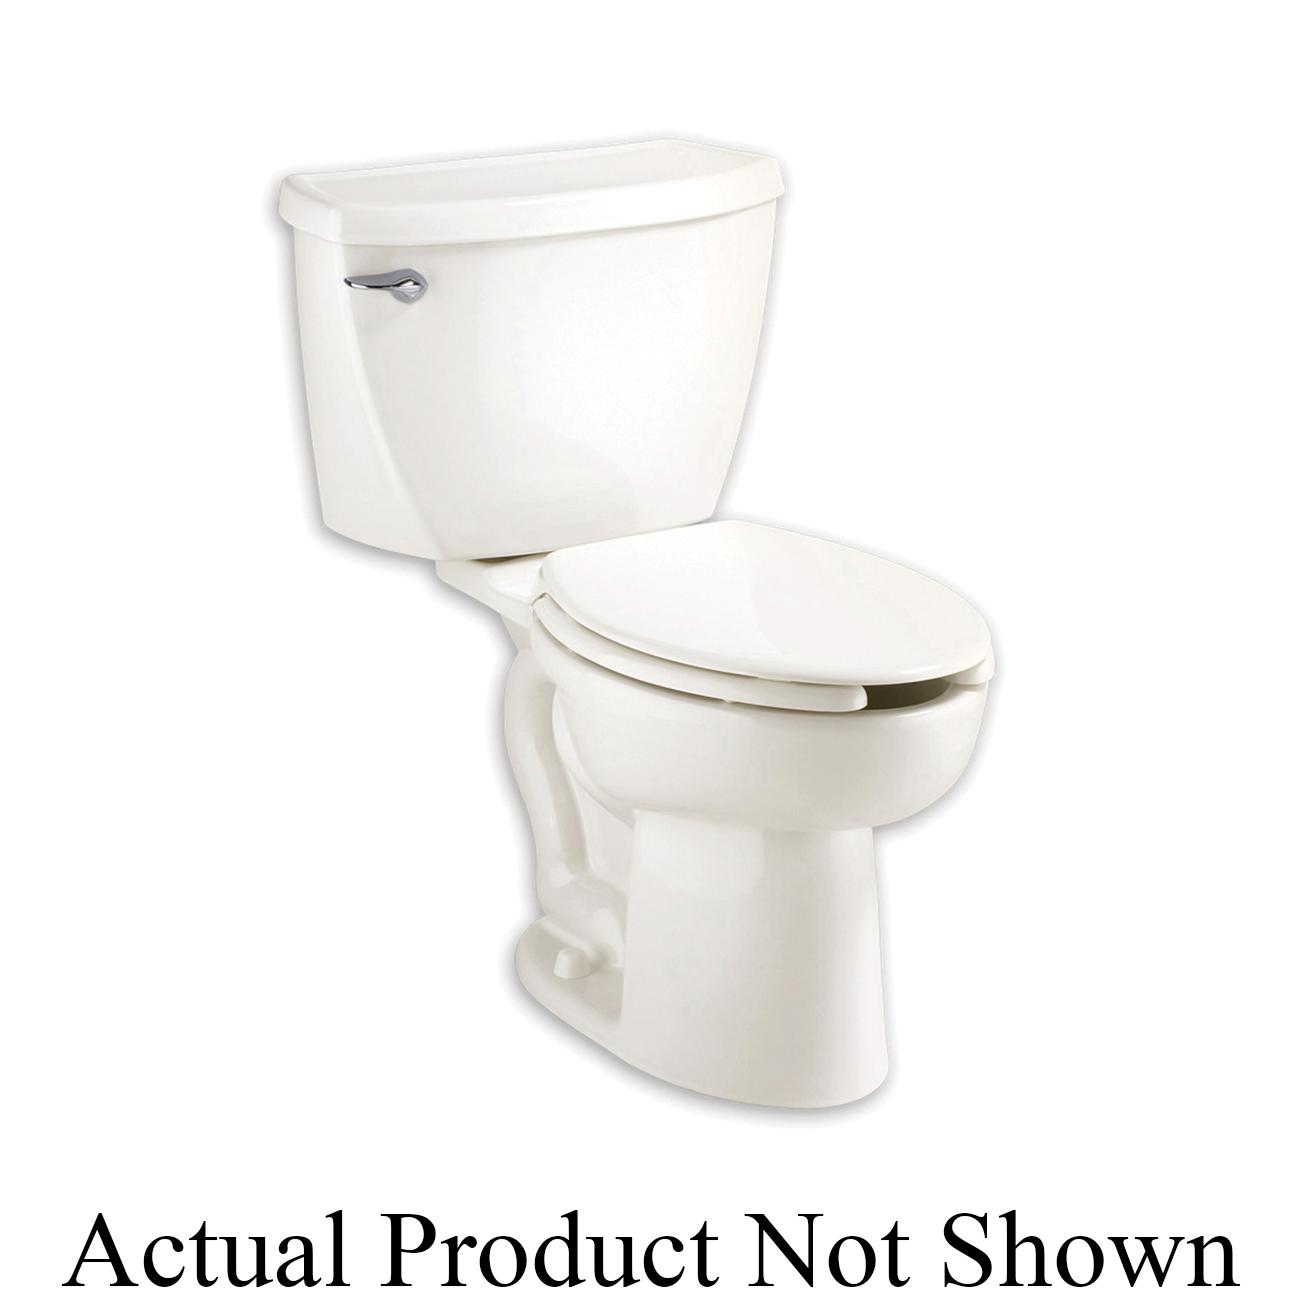 American Standard 3483.001.020